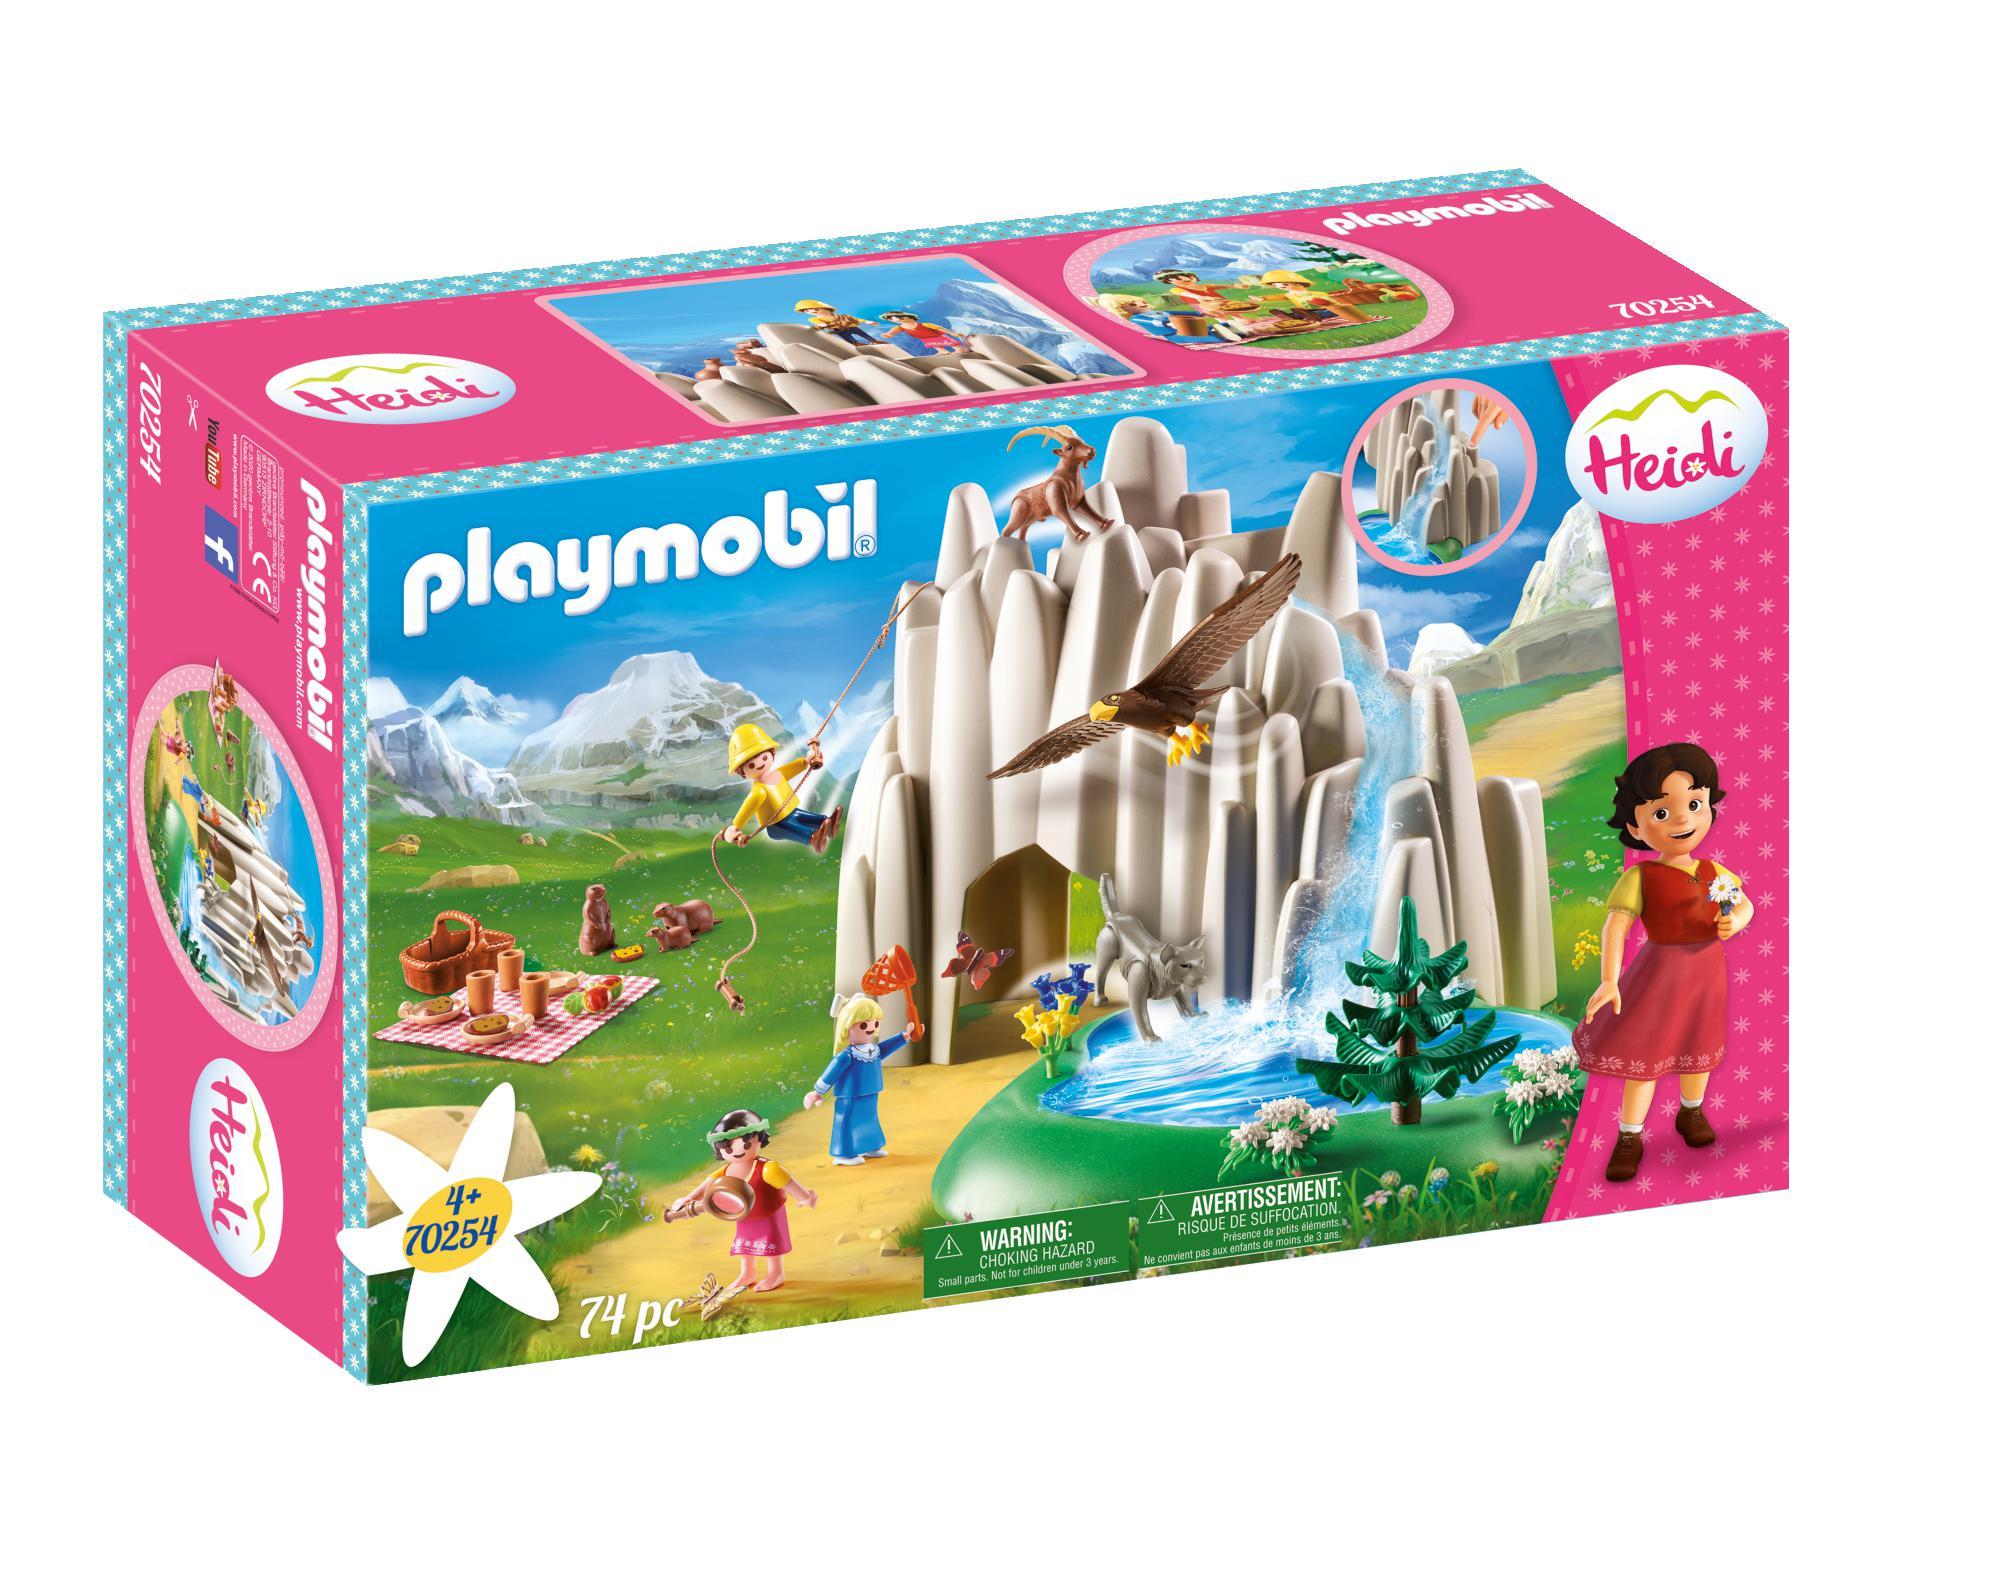 Playmobil Heidi Η Χάιντι, Ο Πέτερ Και Η Κλάρα Στην Κρυστάλλινη Λίμνη 70254